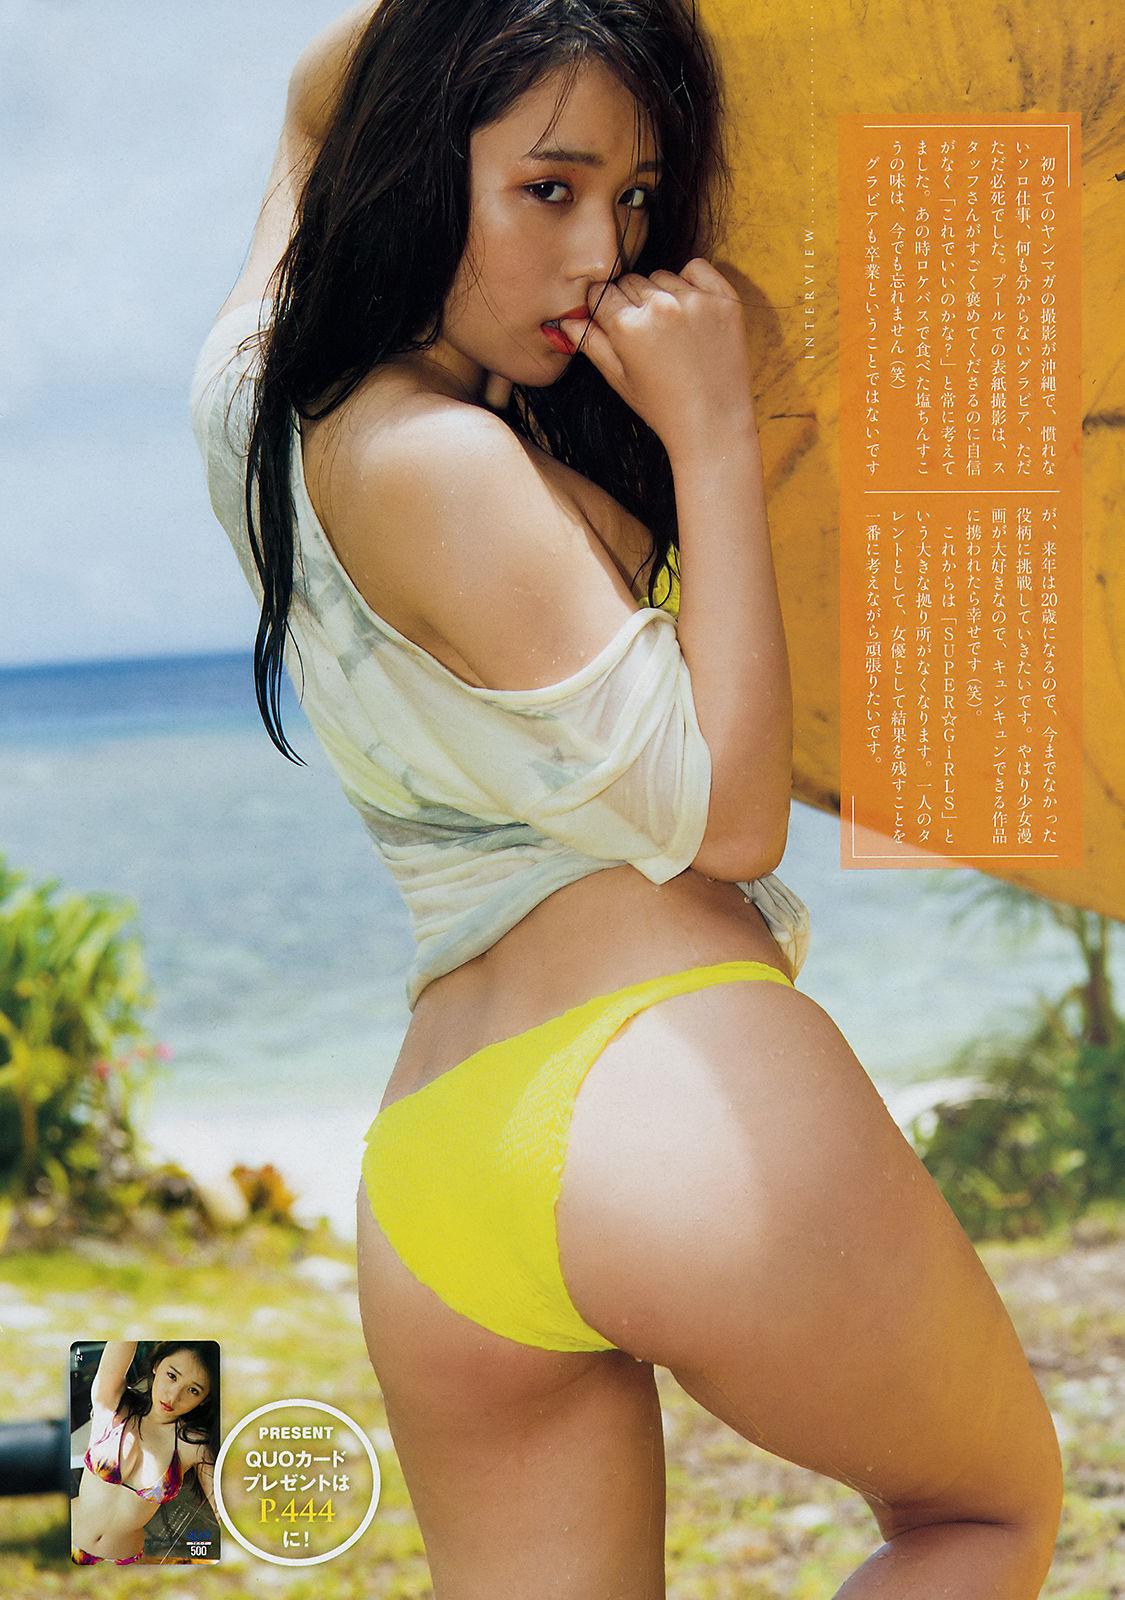 [Young Magazine杂志写真]浅川梨奈超高清写真大图片(11P) 608热度